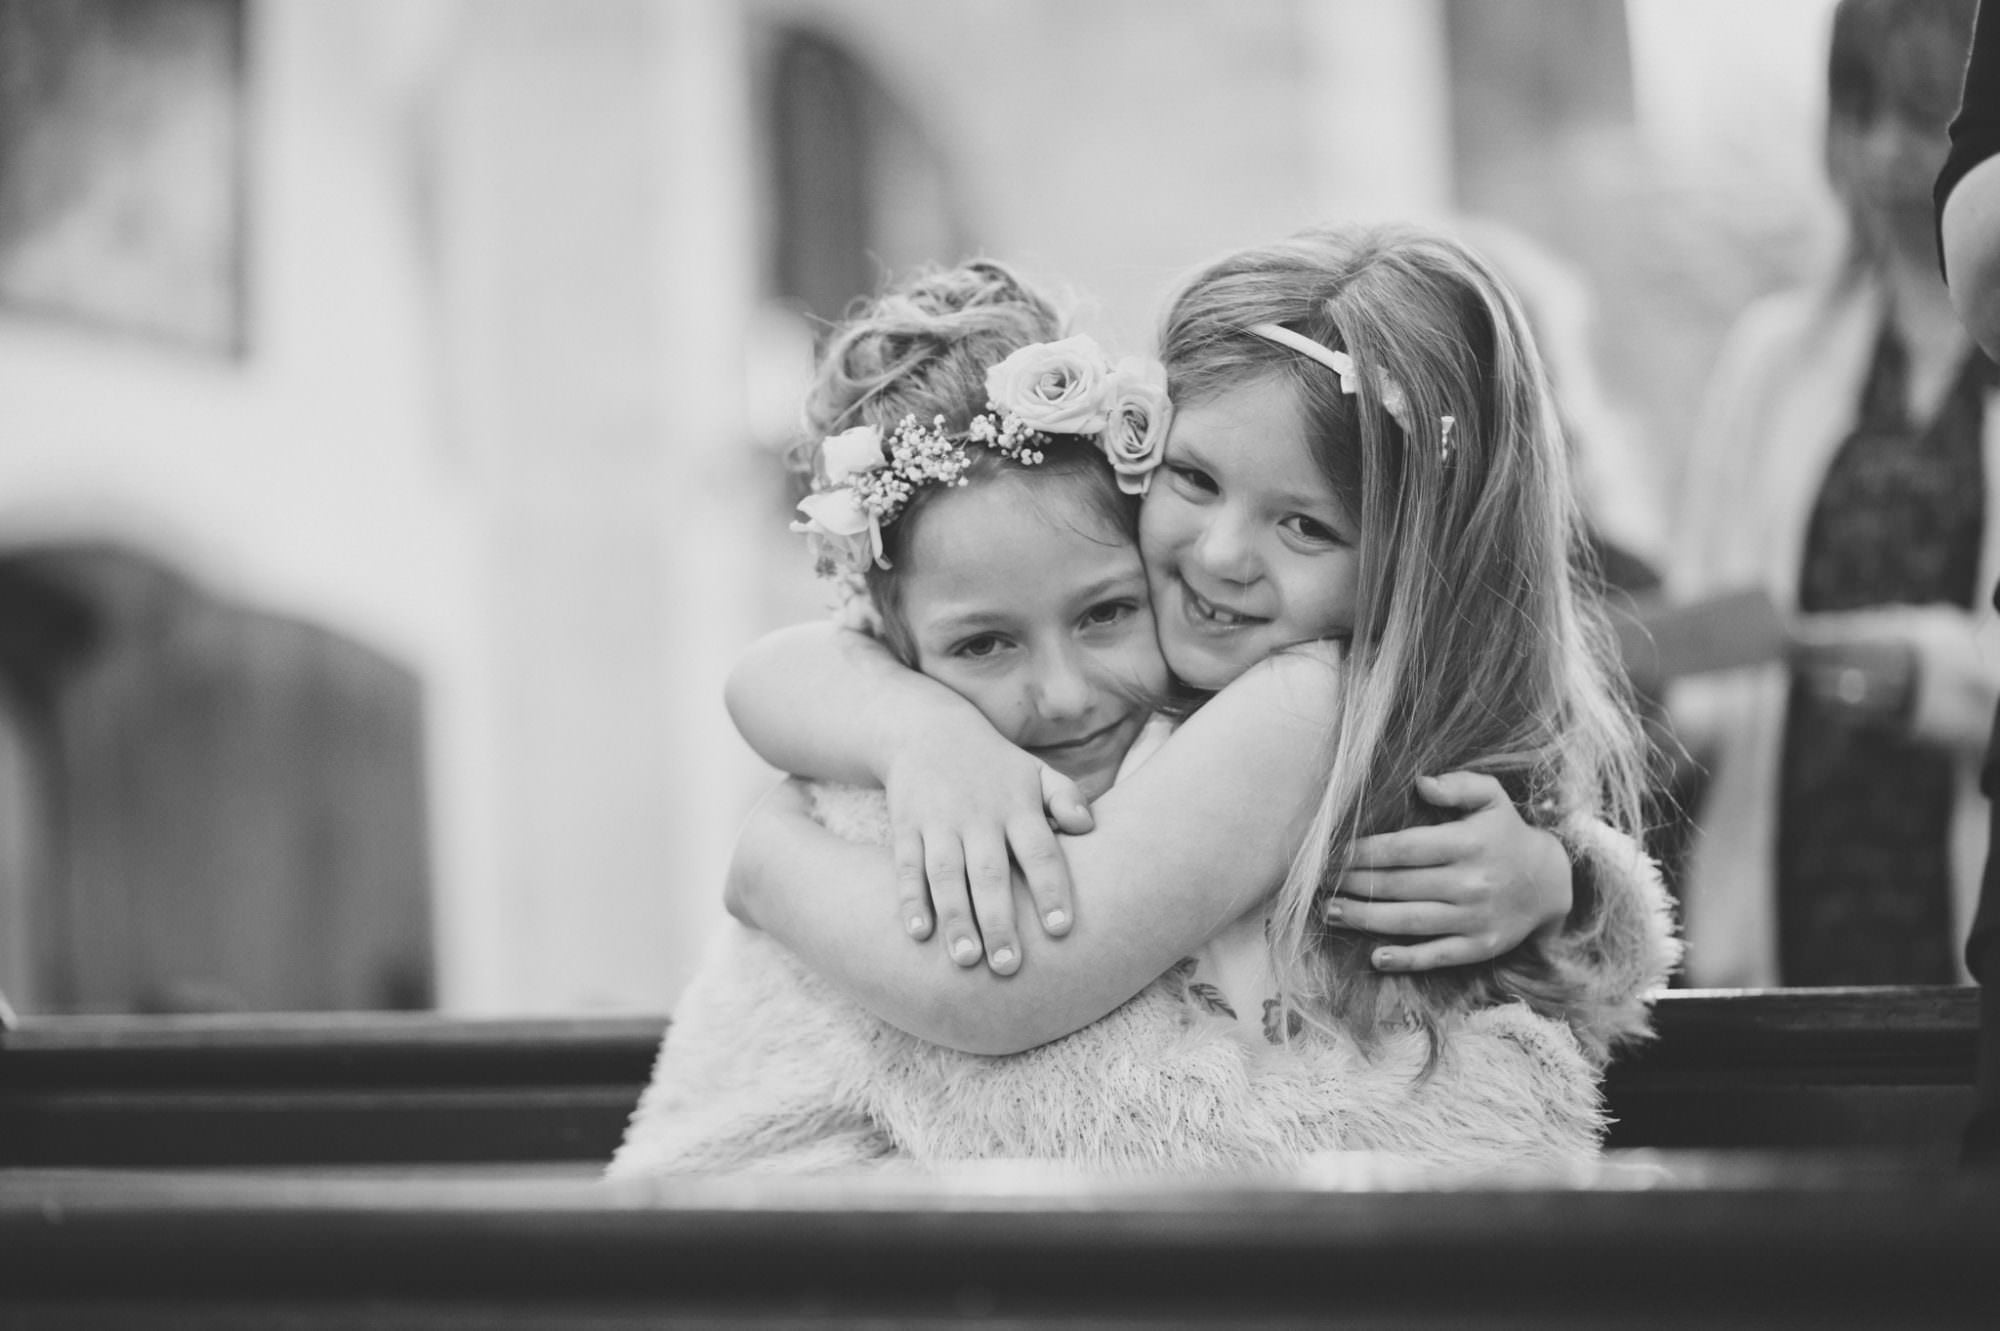 Hampshire wedding photo of young bridesmaids